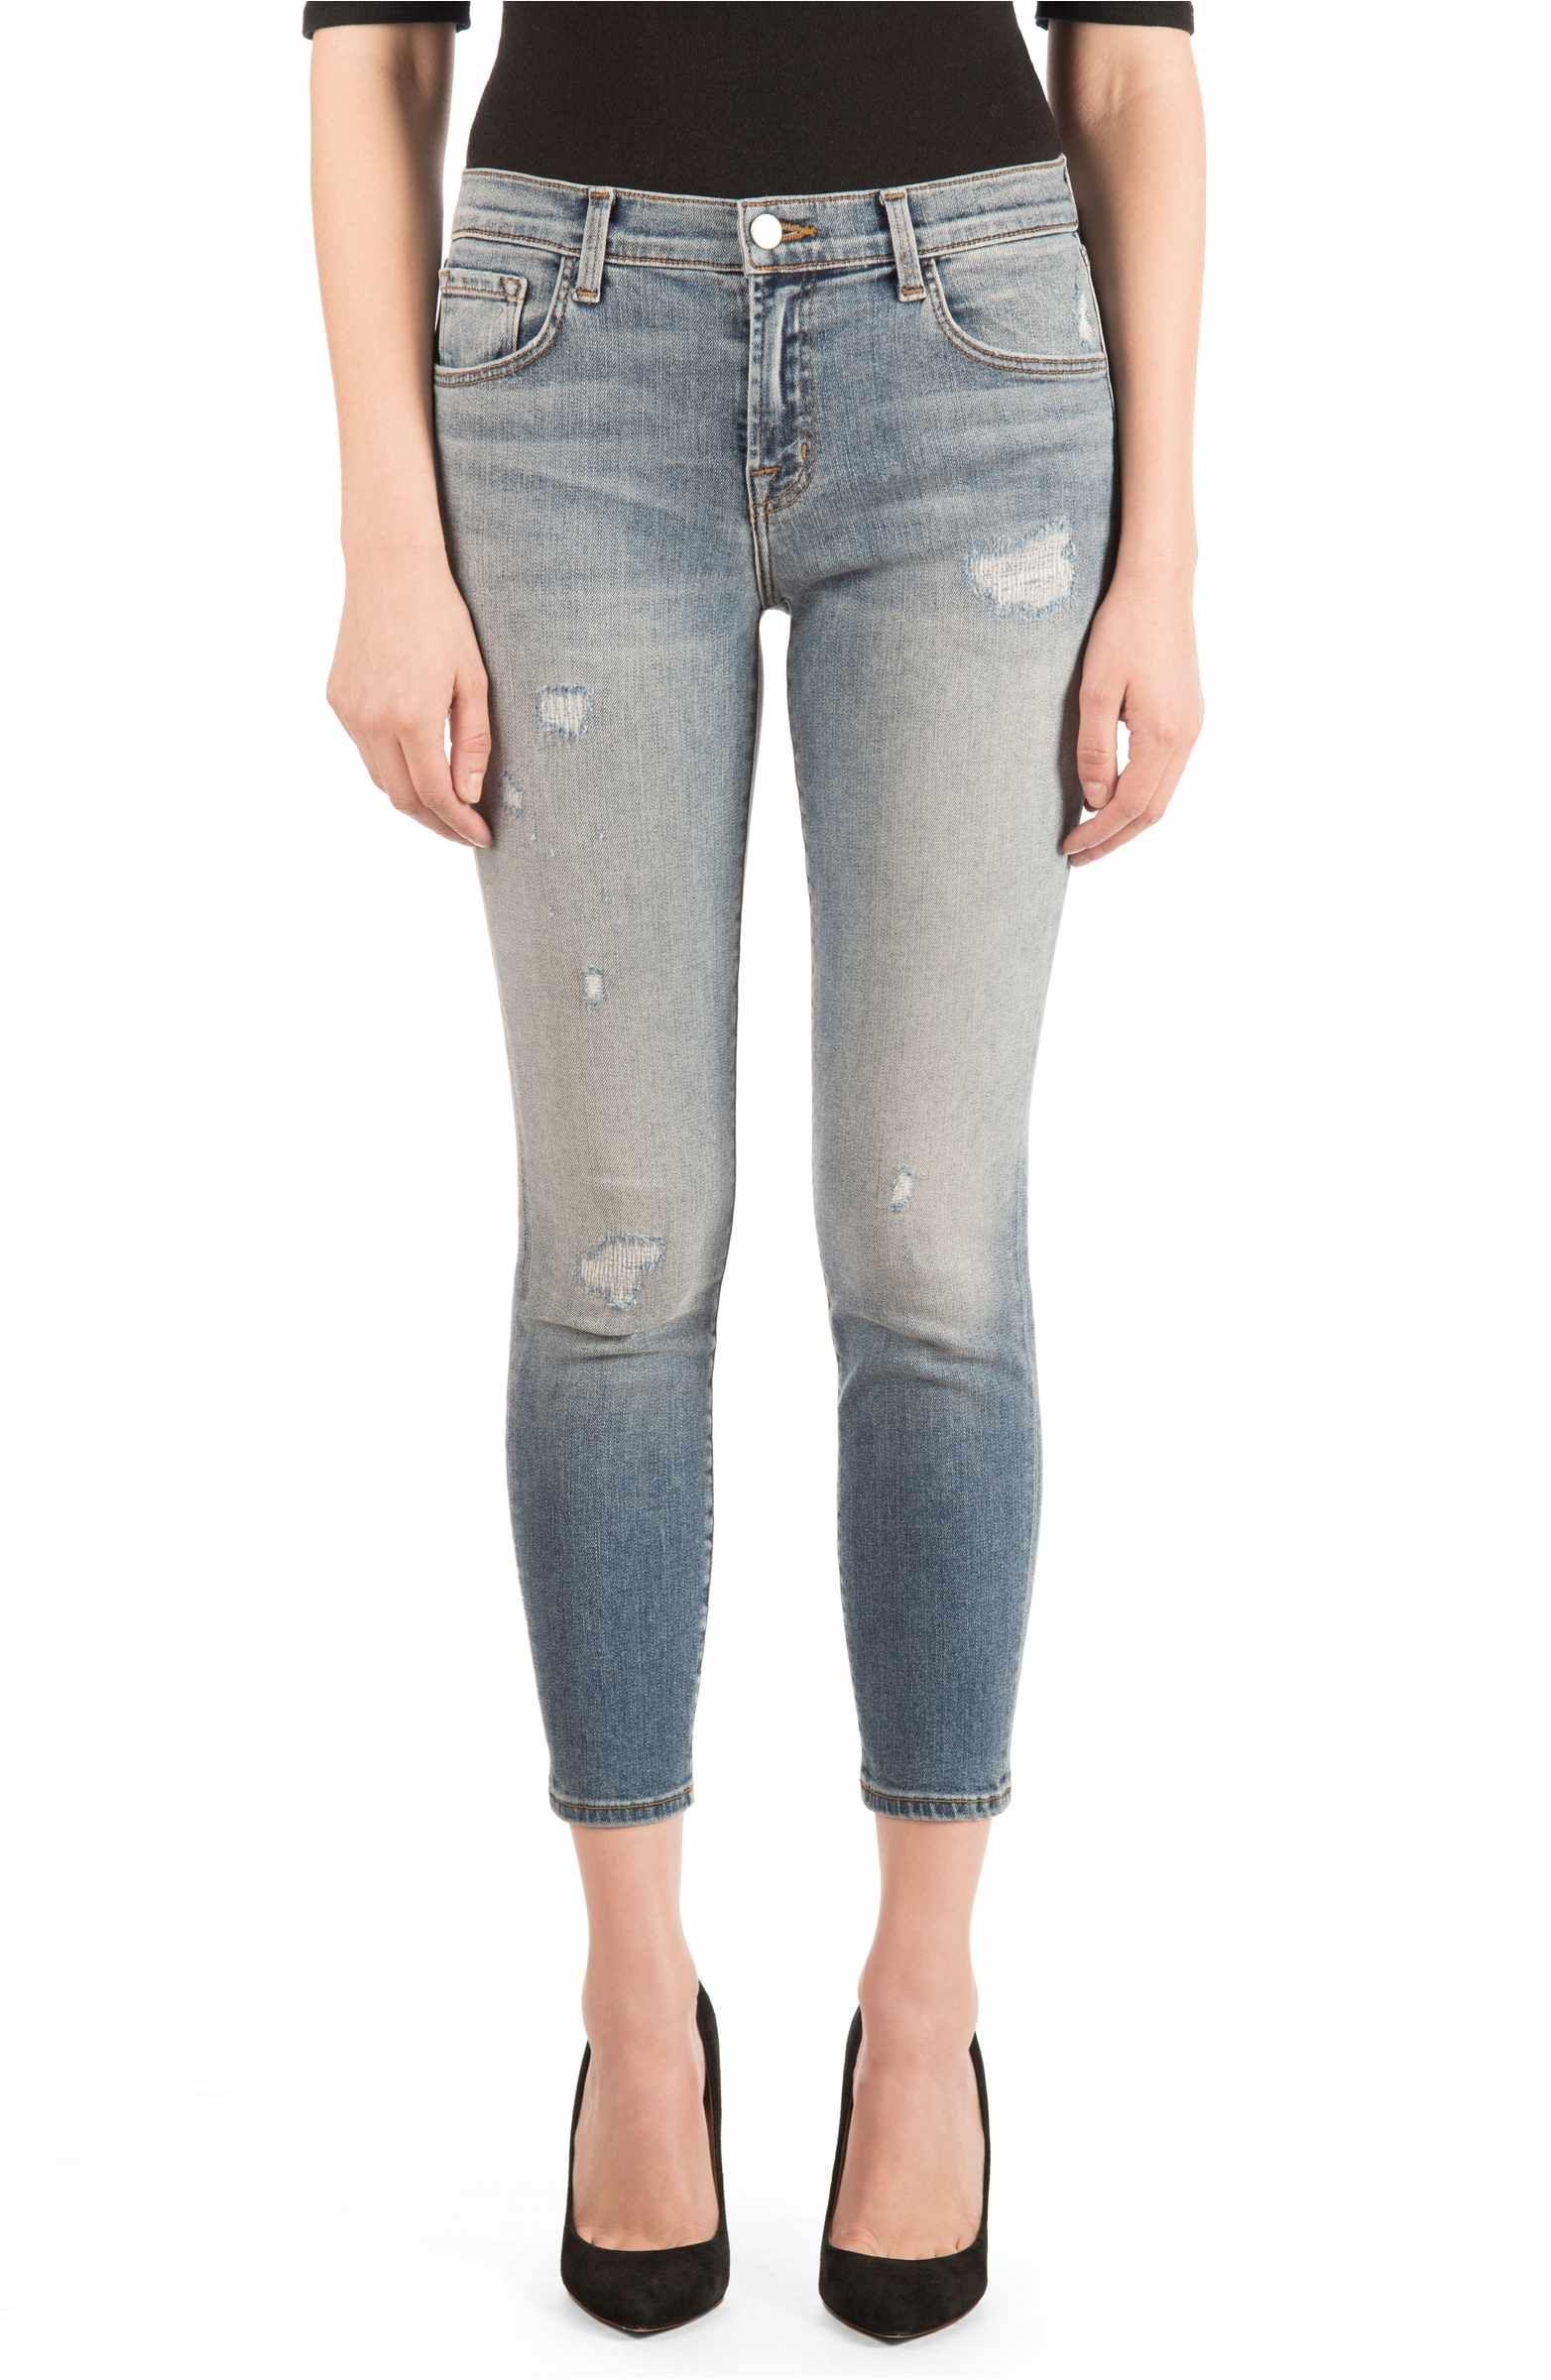 bb9f2095bffd Main Image - J Brand 835 Distressed Capri Skinny Jeans (Nolita ...